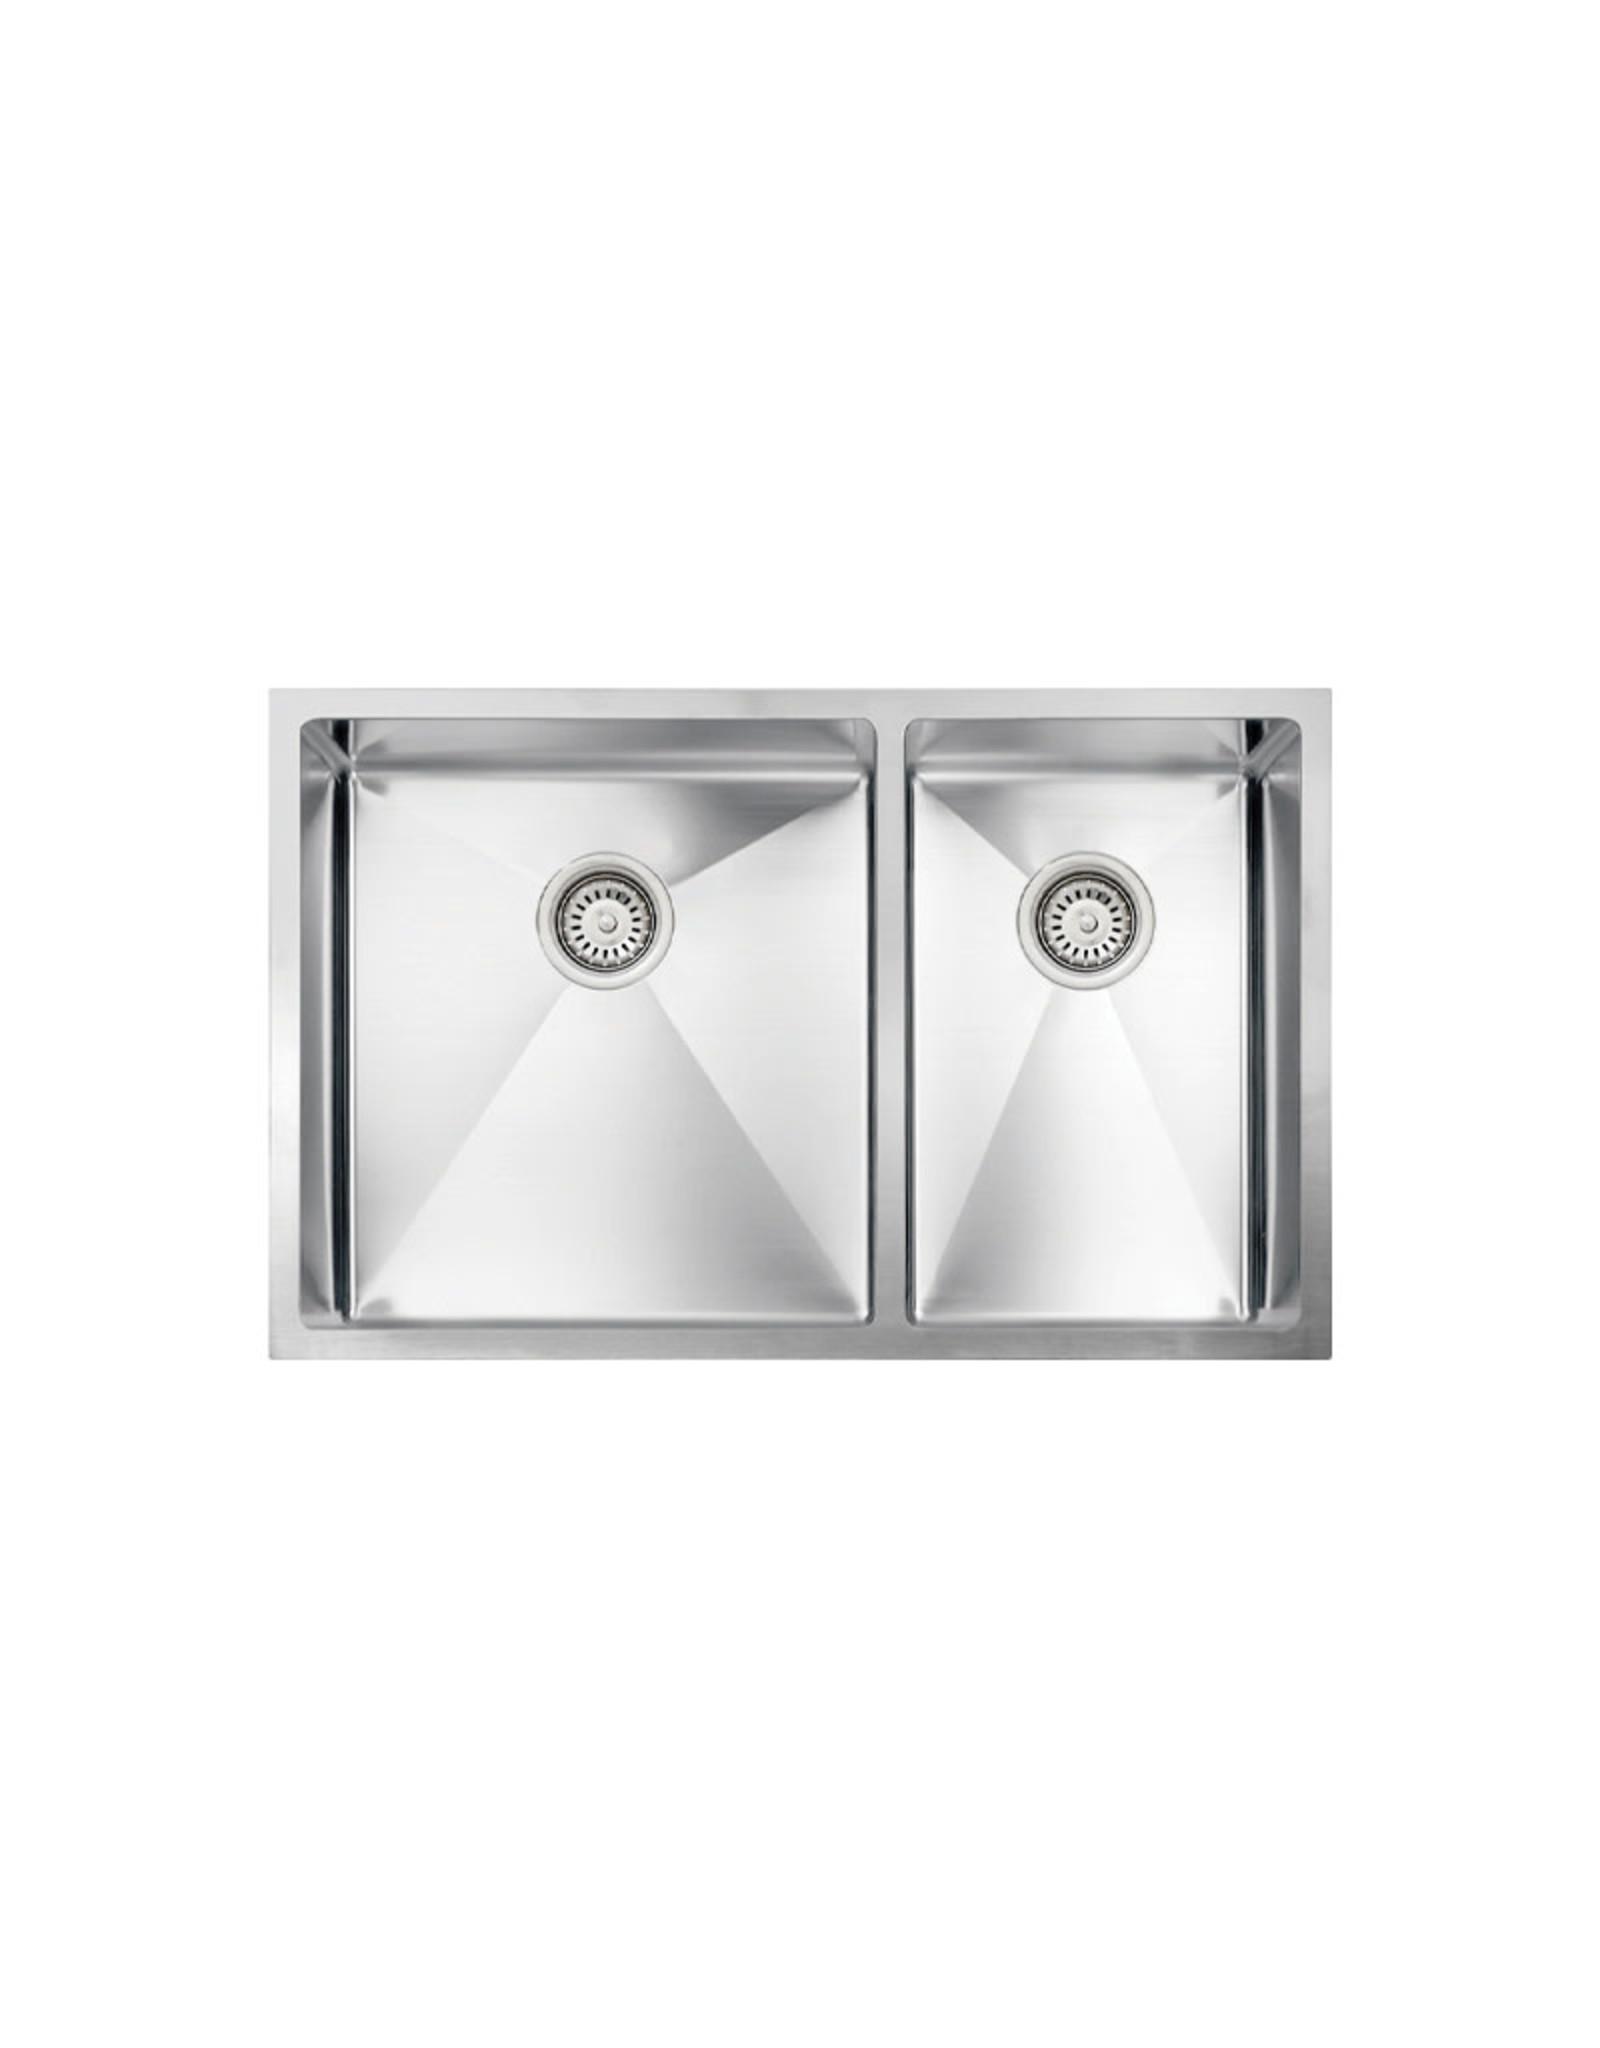 "Vogt Ternitz 18R Undermount Kitchen Sink Double Bowl (60/40) 30"" x 18"" x 10"" With Bottom Grids"